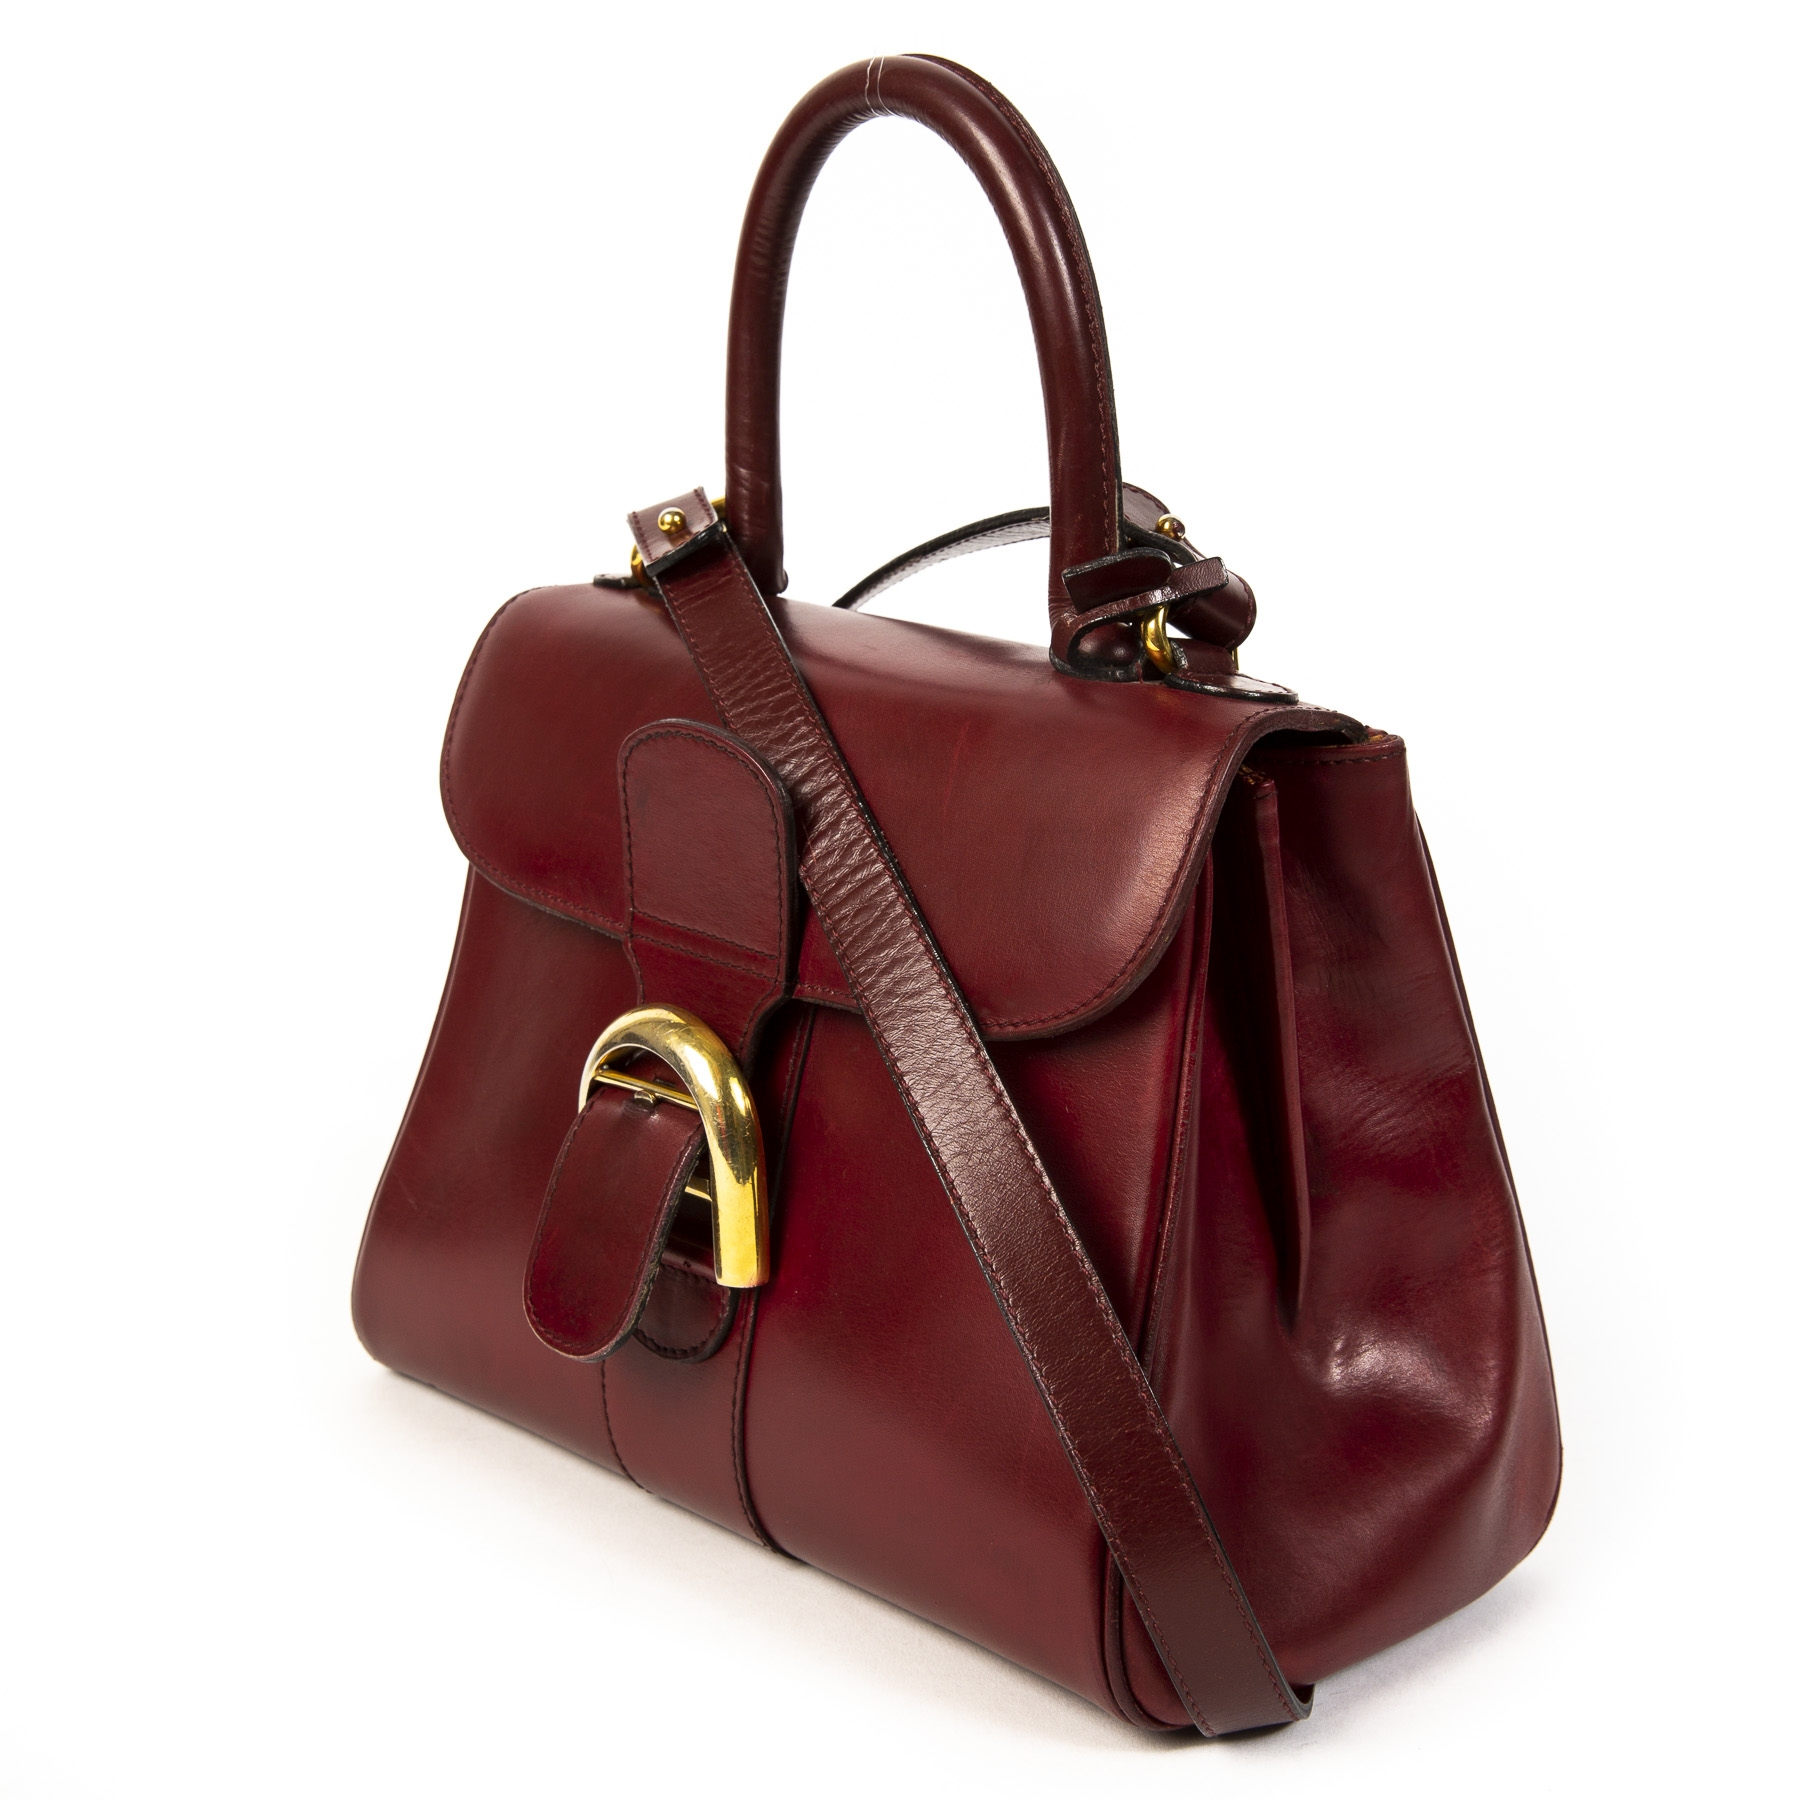 koop online tegen de beste prijs Delvaux Vintage Burgundy Boxcalf Brillant PM + Strap